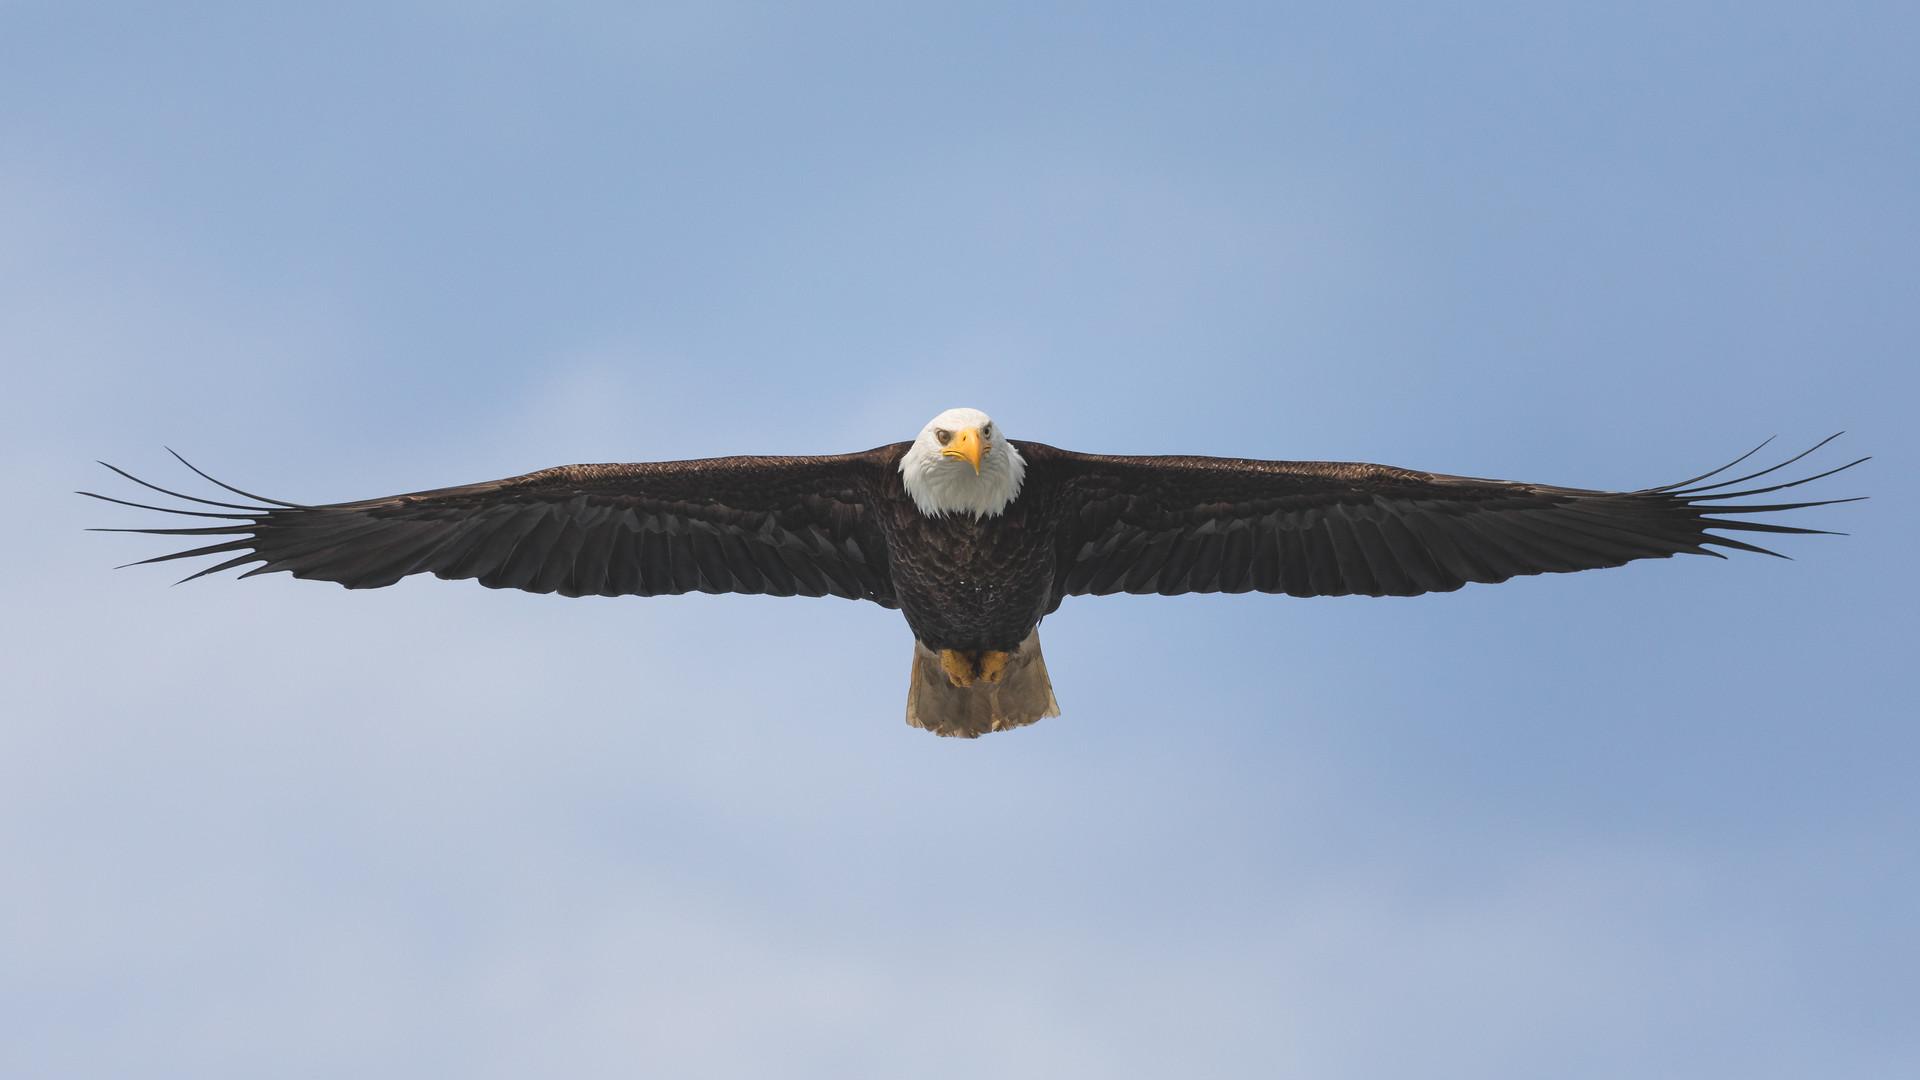 Wild eagle photography by Jenni Lisacek